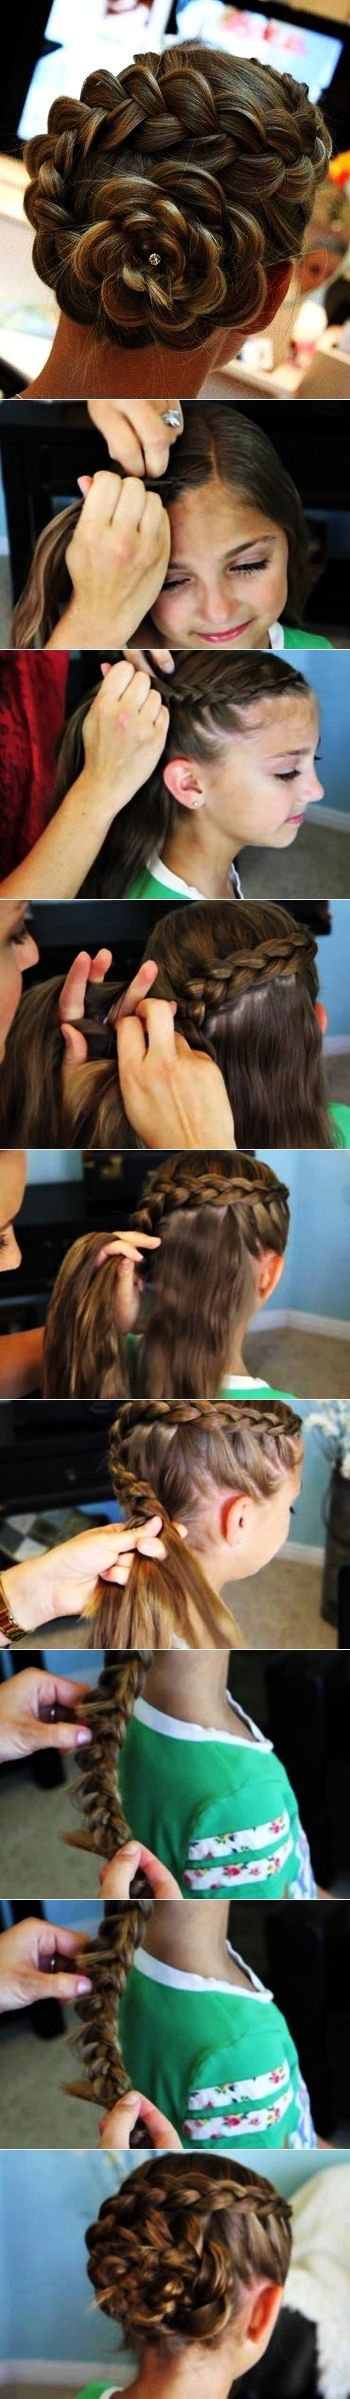 Diy side braid rose flower hairstyle tutorial scary hair style